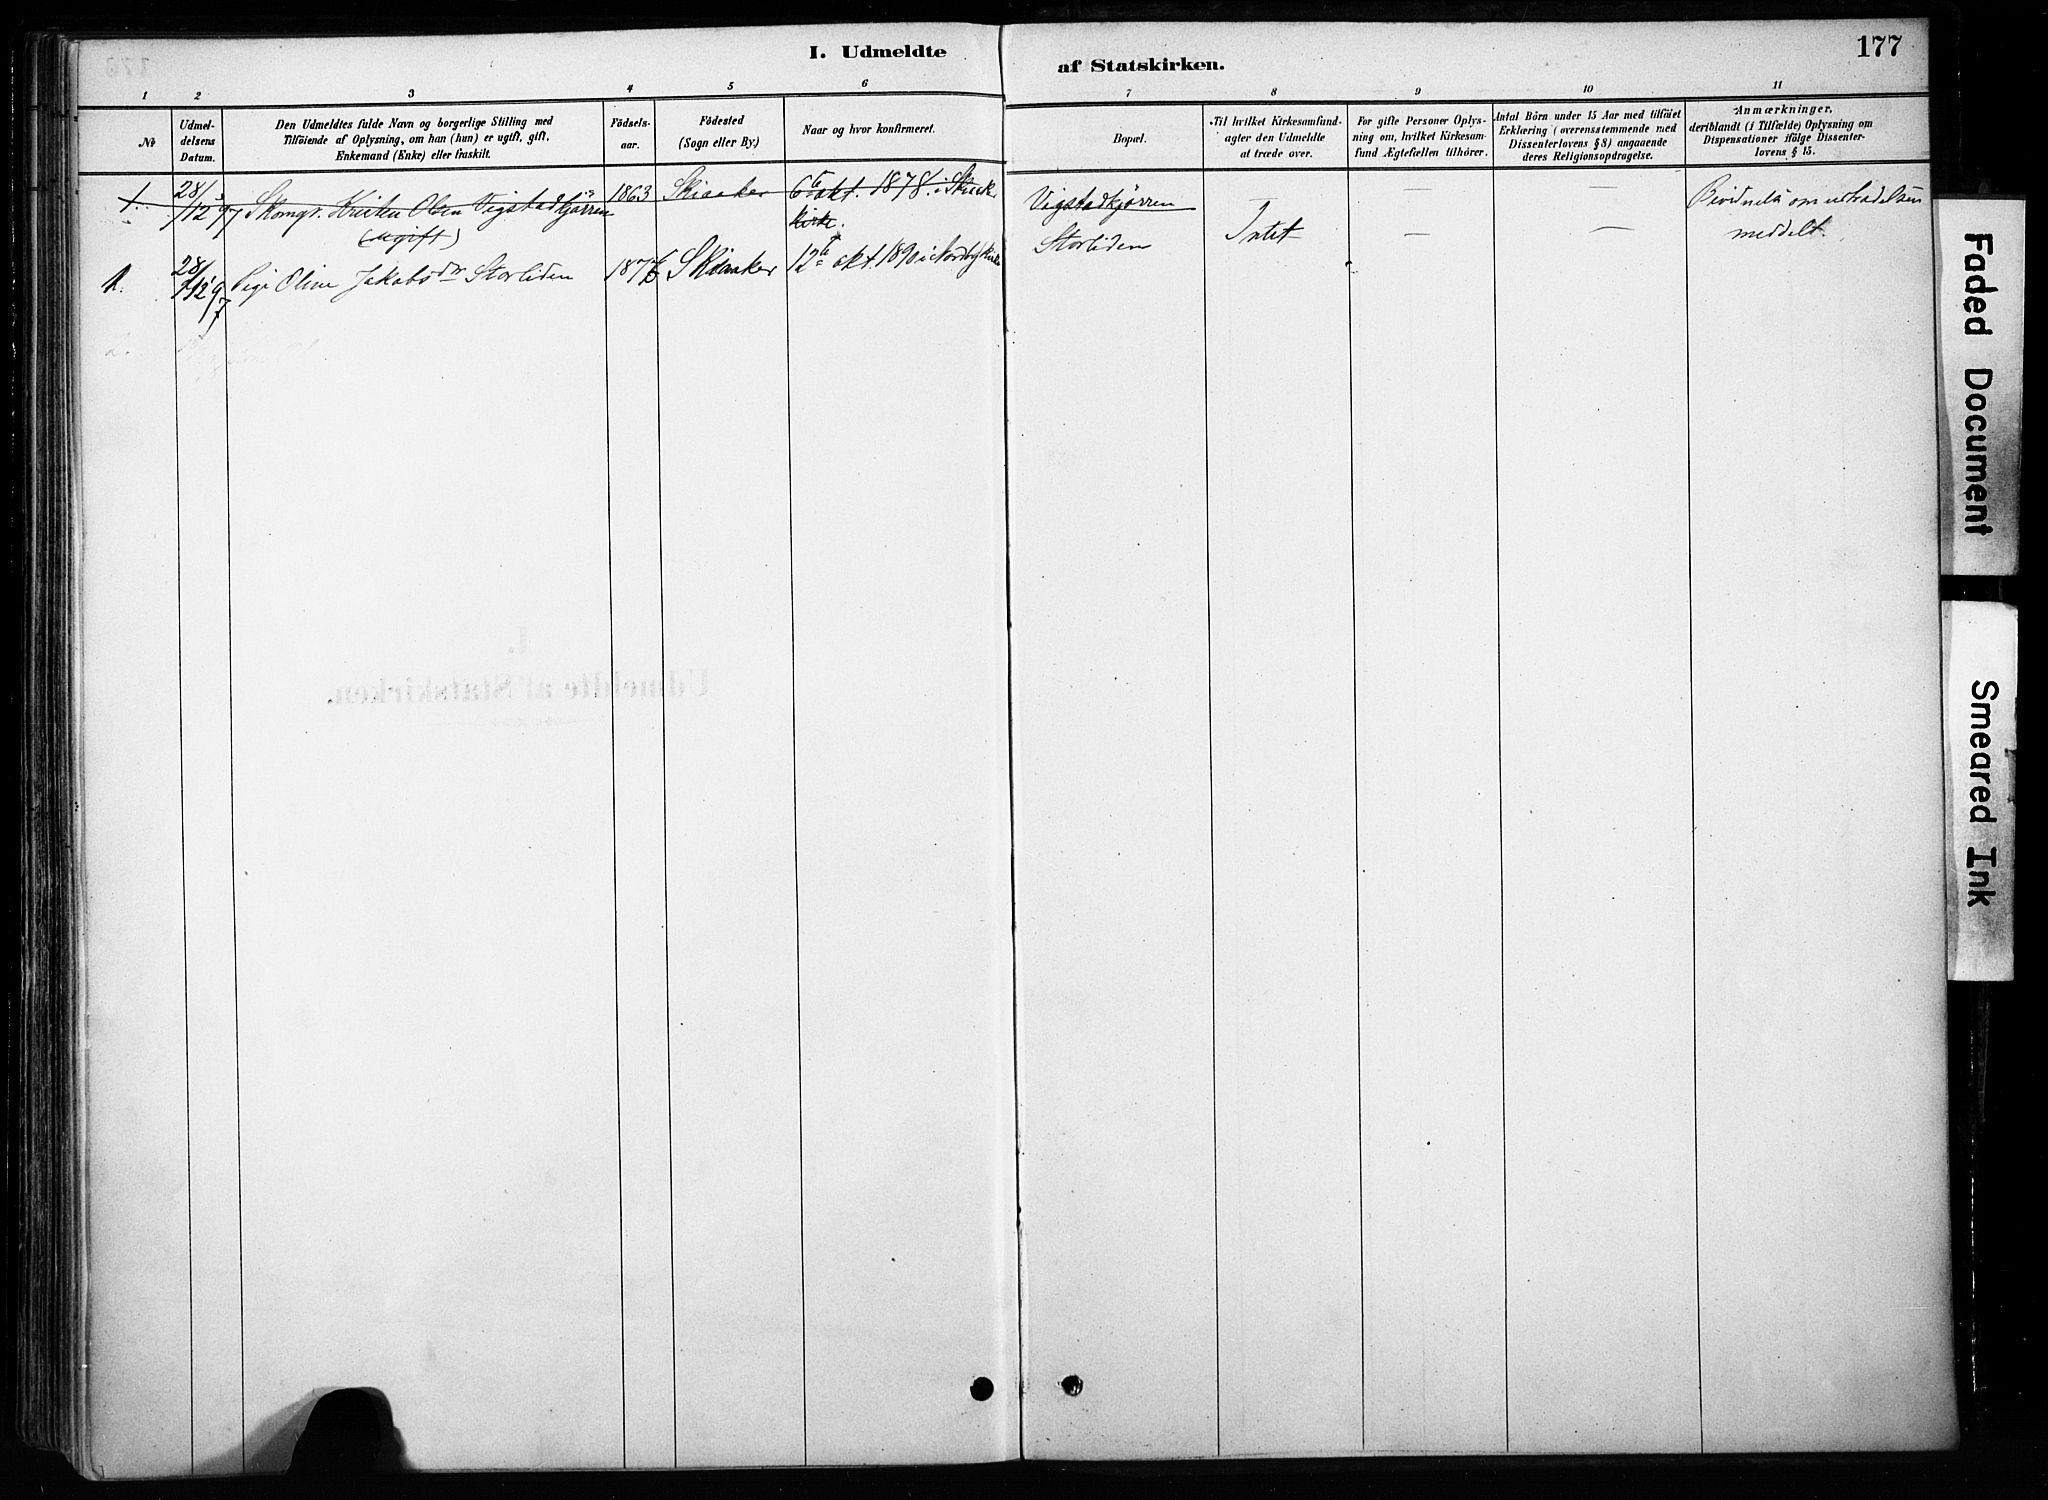 SAH, Skjåk prestekontor, Ministerialbok nr. 4, 1880-1904, s. 177